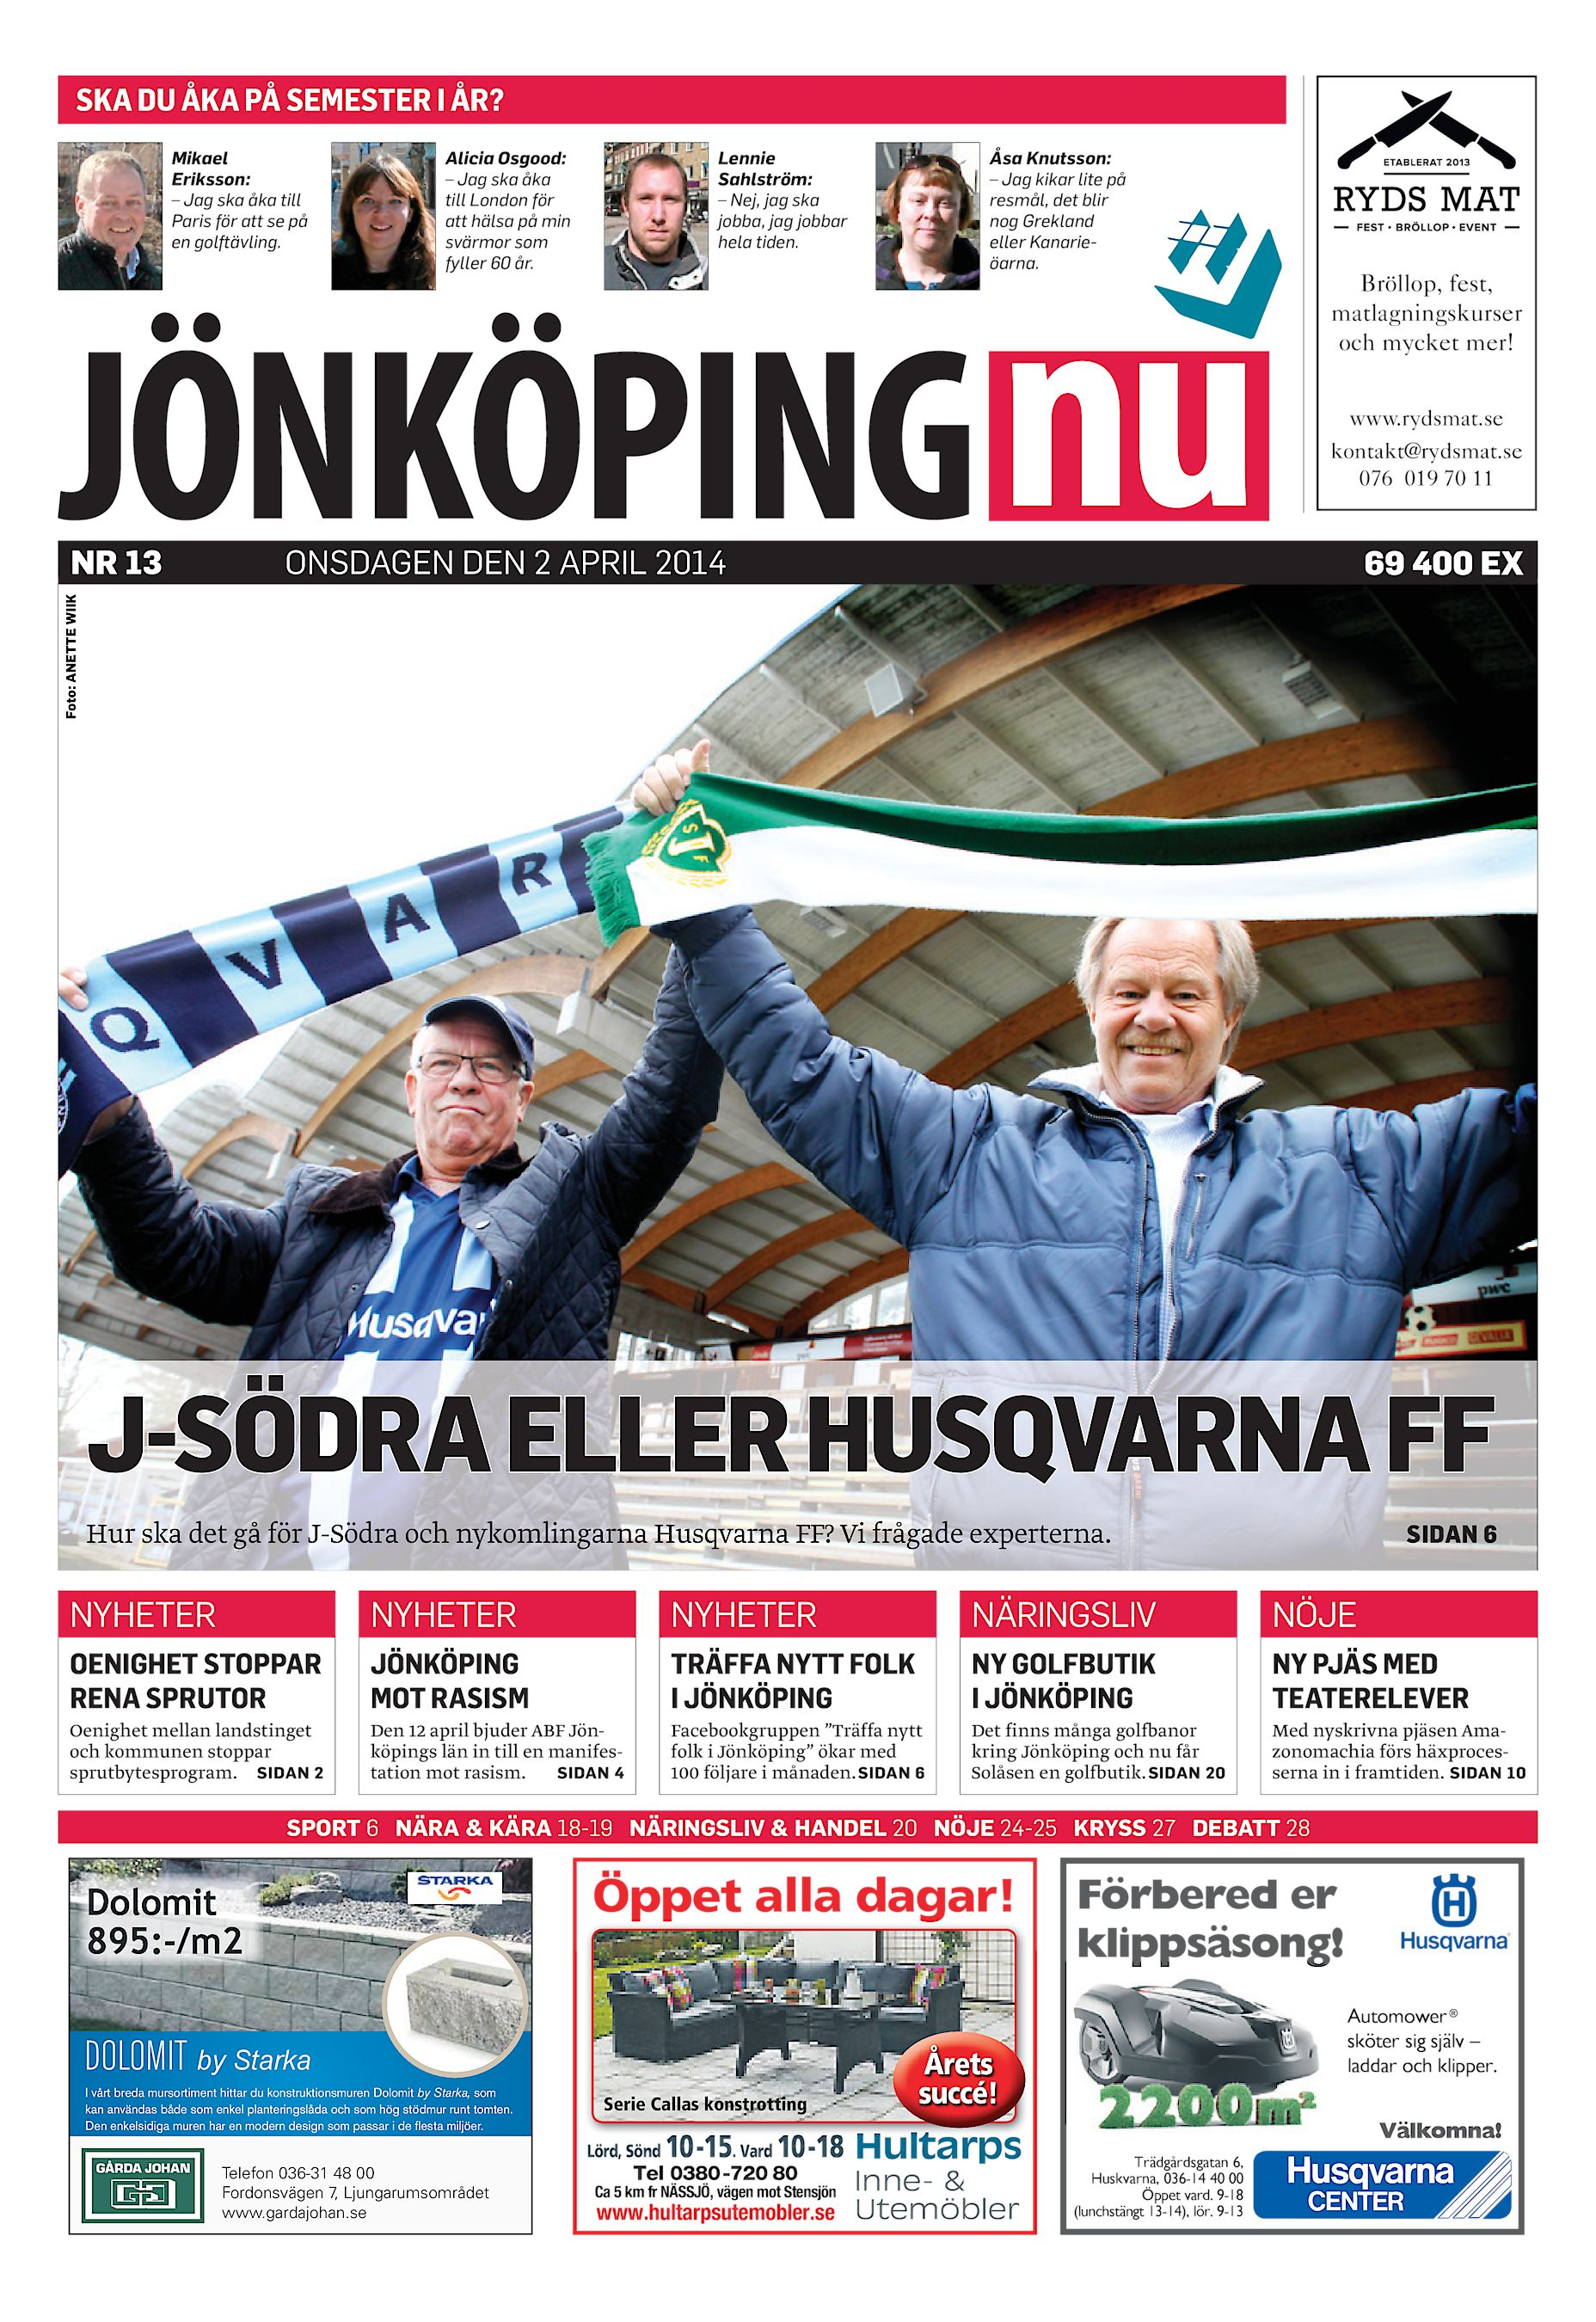 cf65ecf5f49a Jönköping.nu JNU-2014-04-02 (text only)